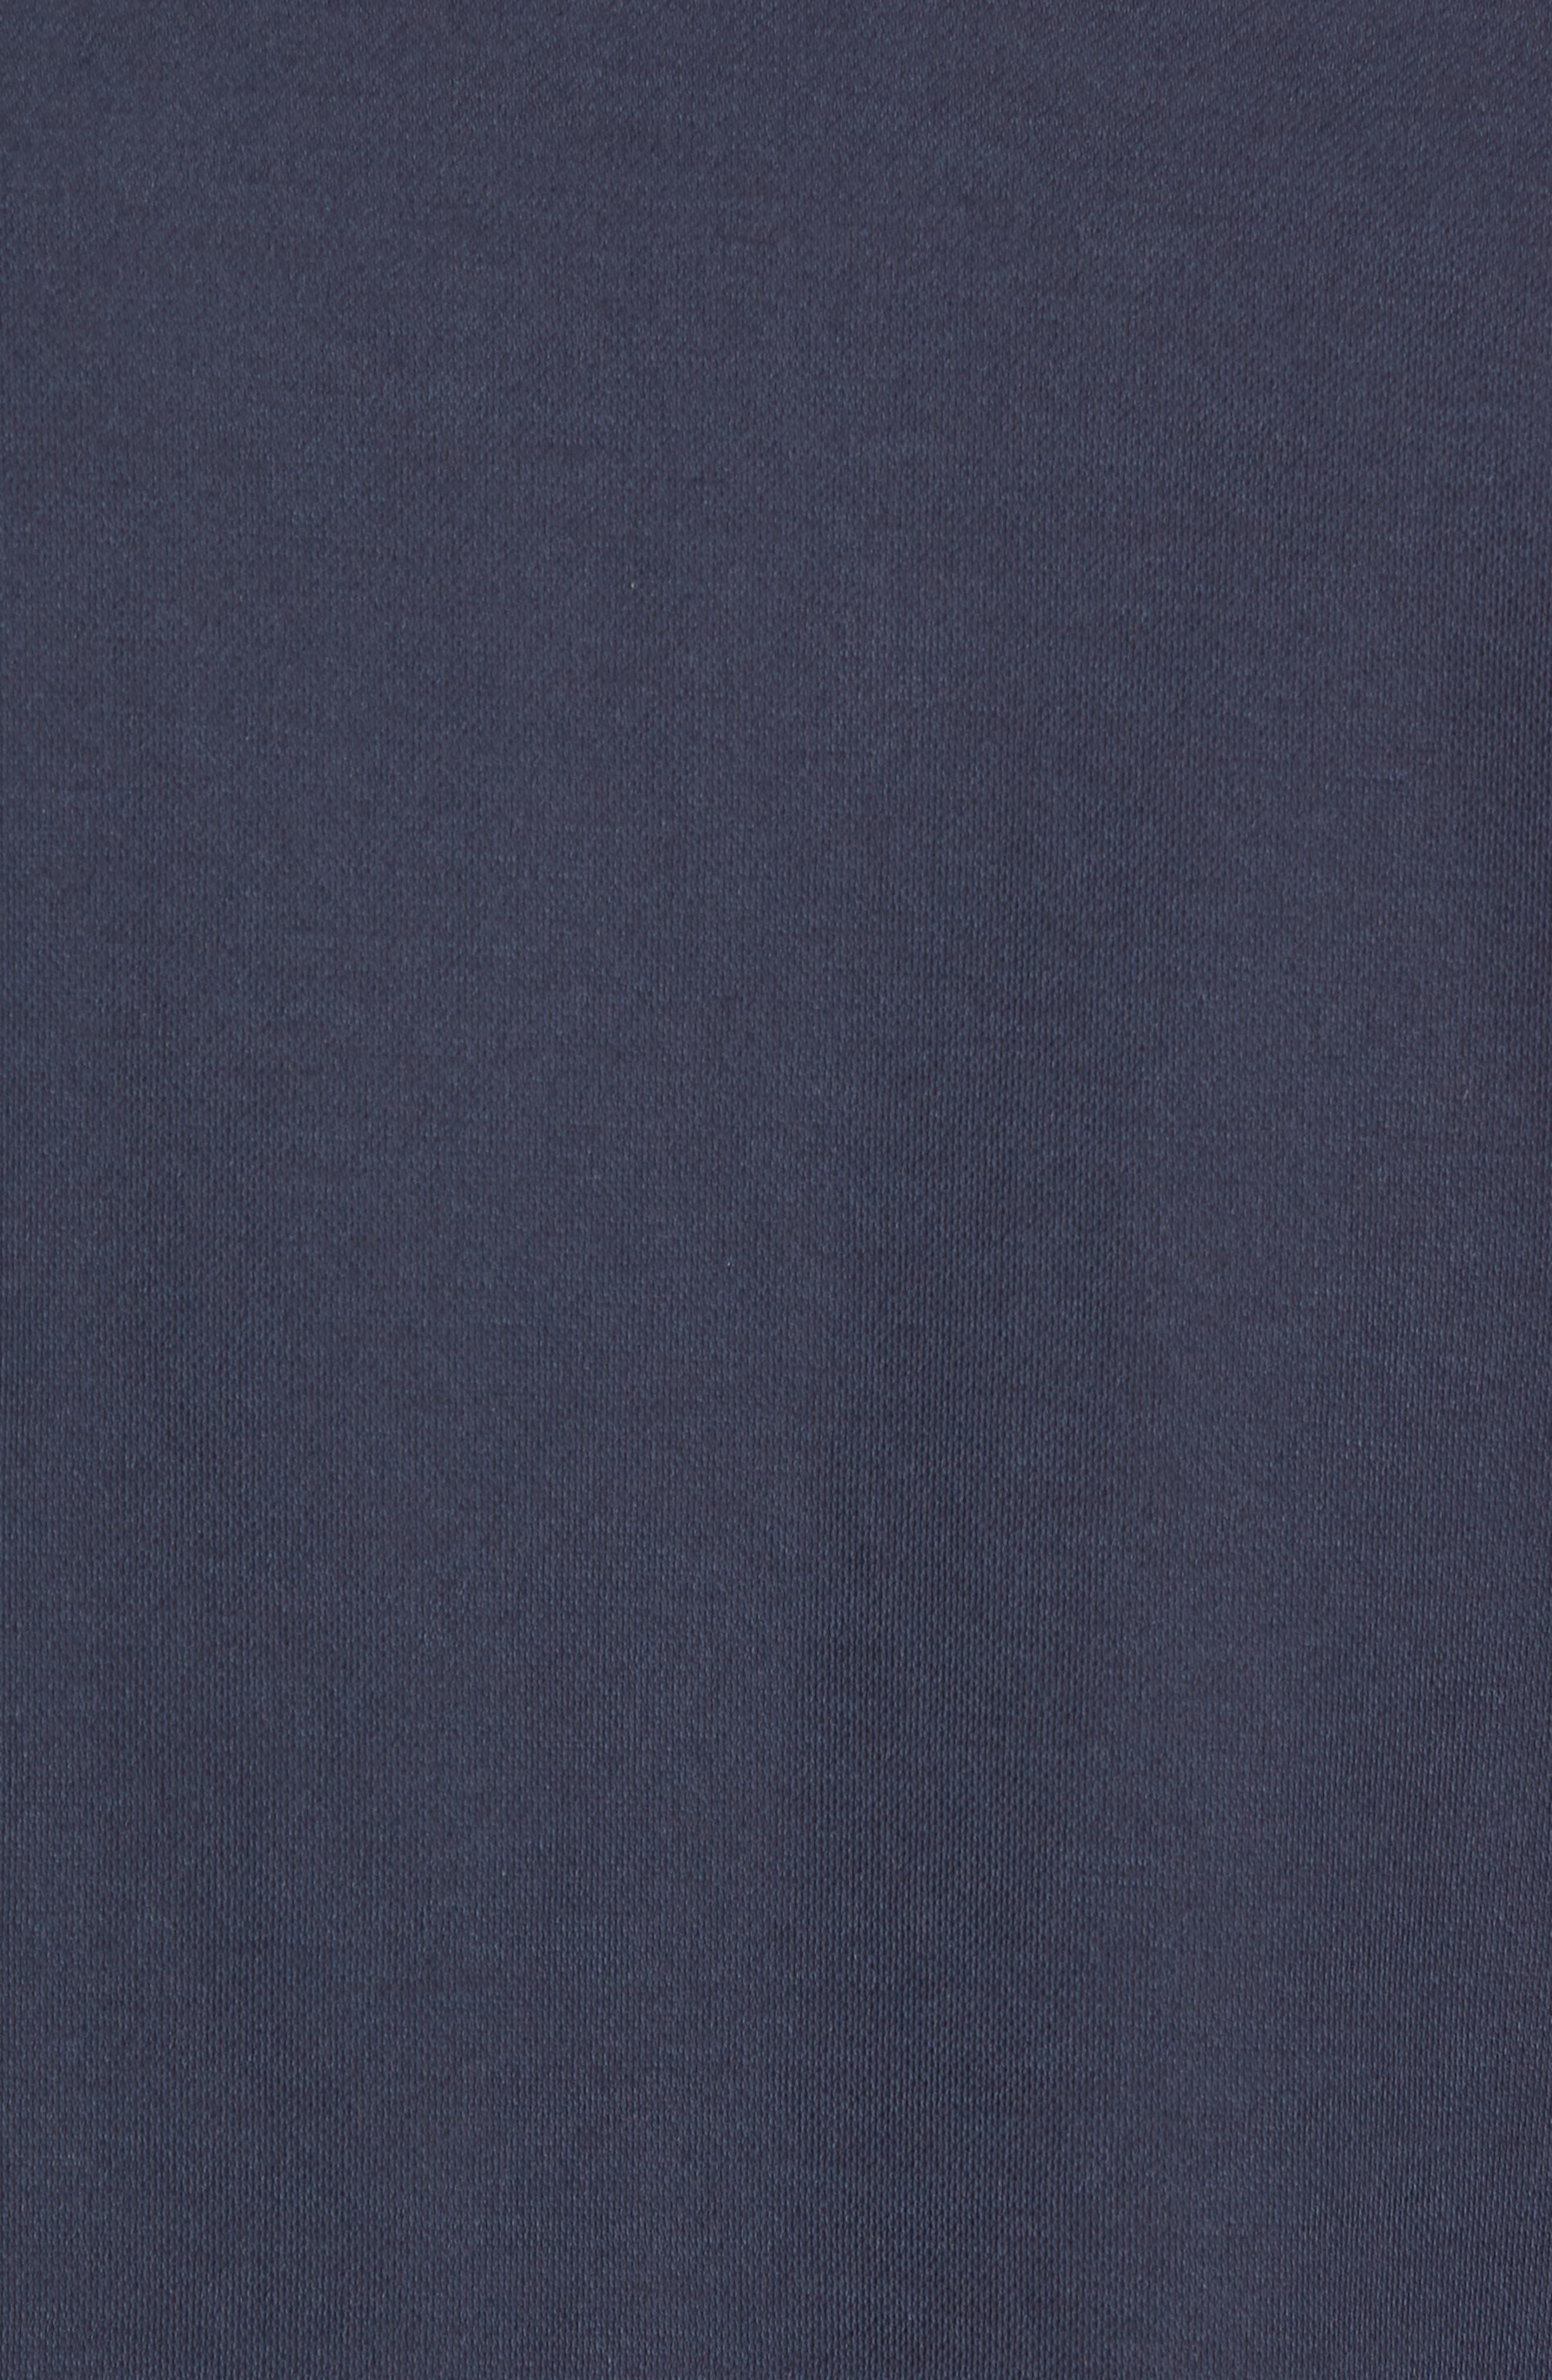 Gibli Pocket Polo,                             Alternate thumbnail 5, color,                             Blue Nights